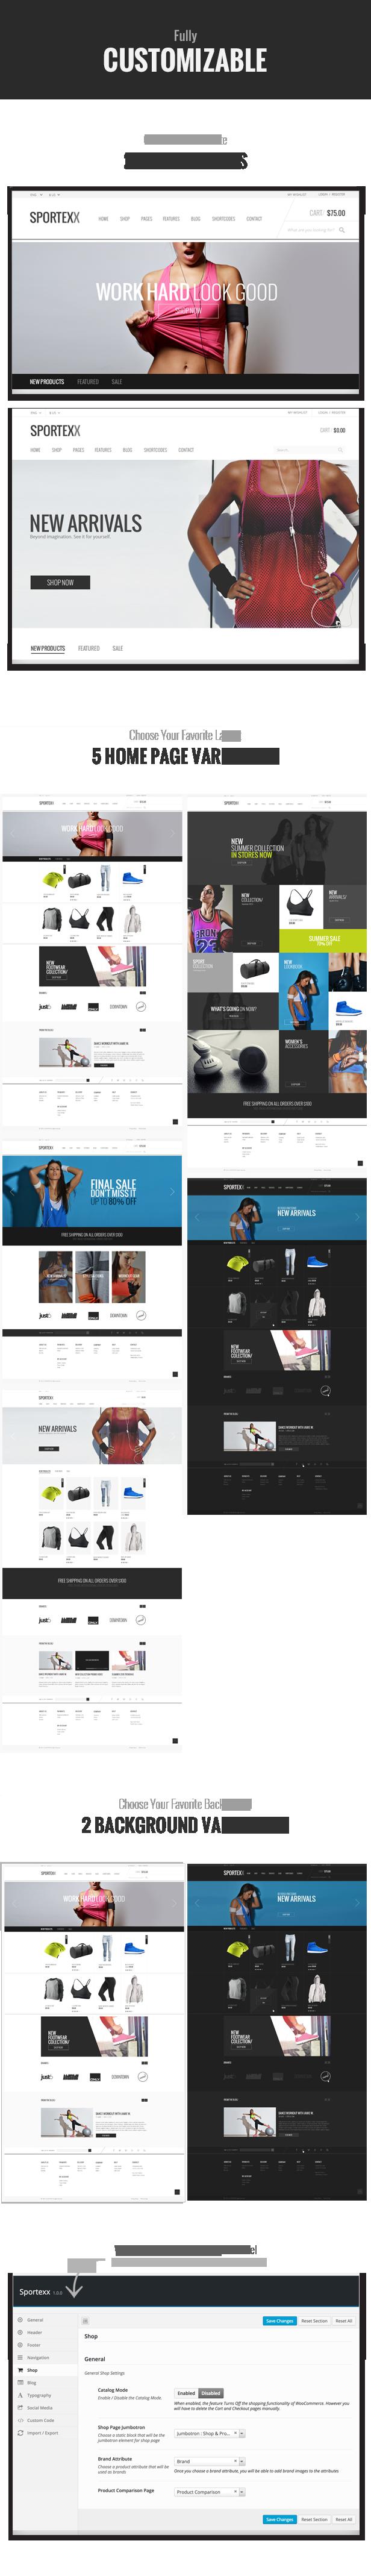 Sportexx - Sports & Gym Fashion WooCommerce Theme - 7